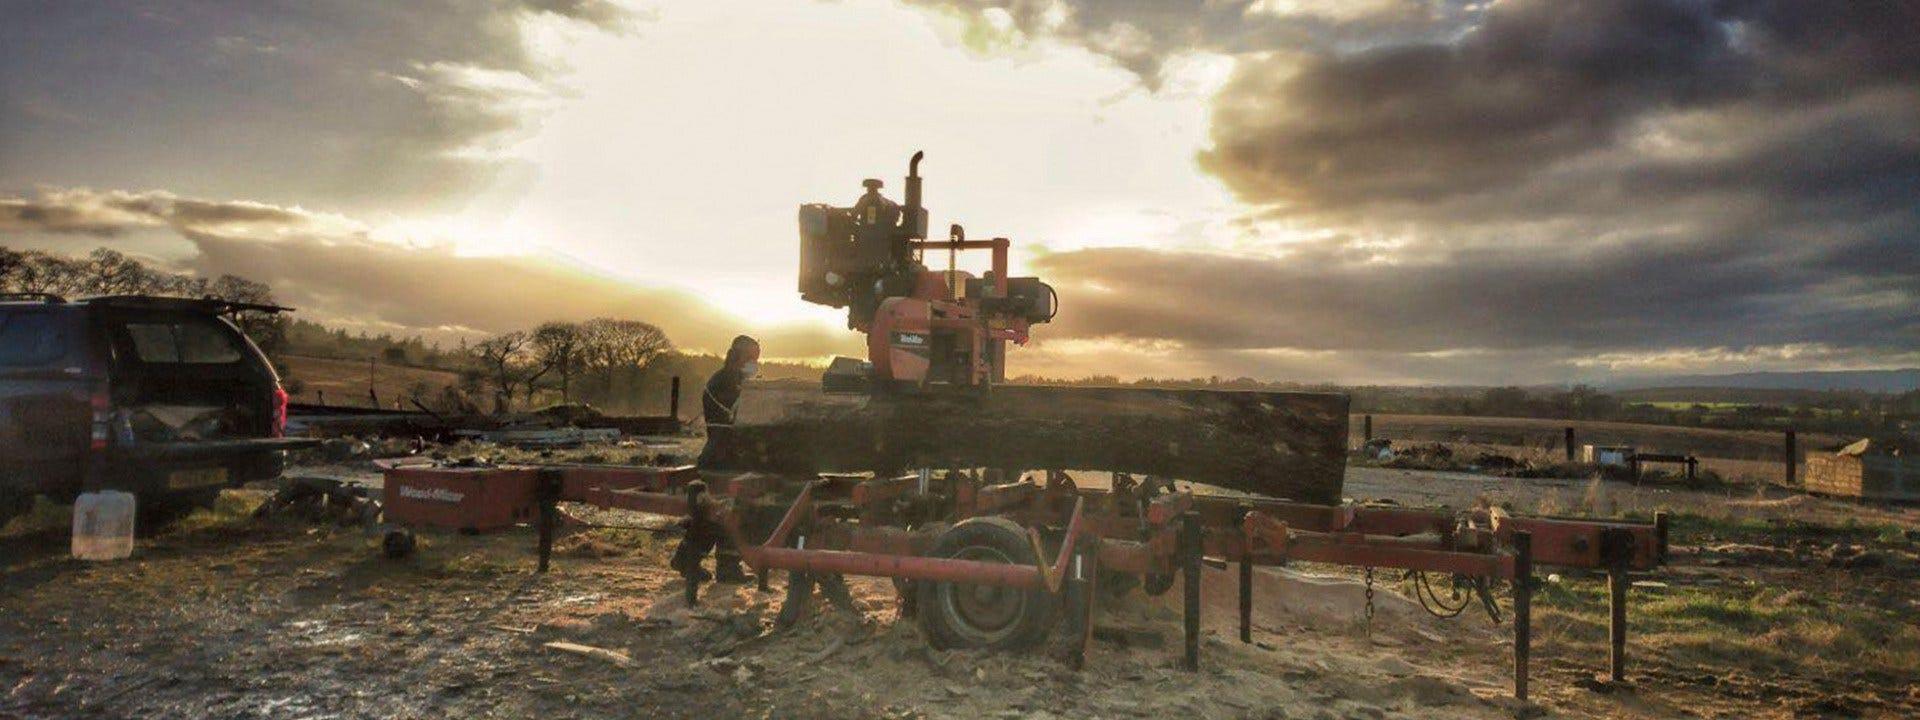 Mobile Sawmilling in Scotland